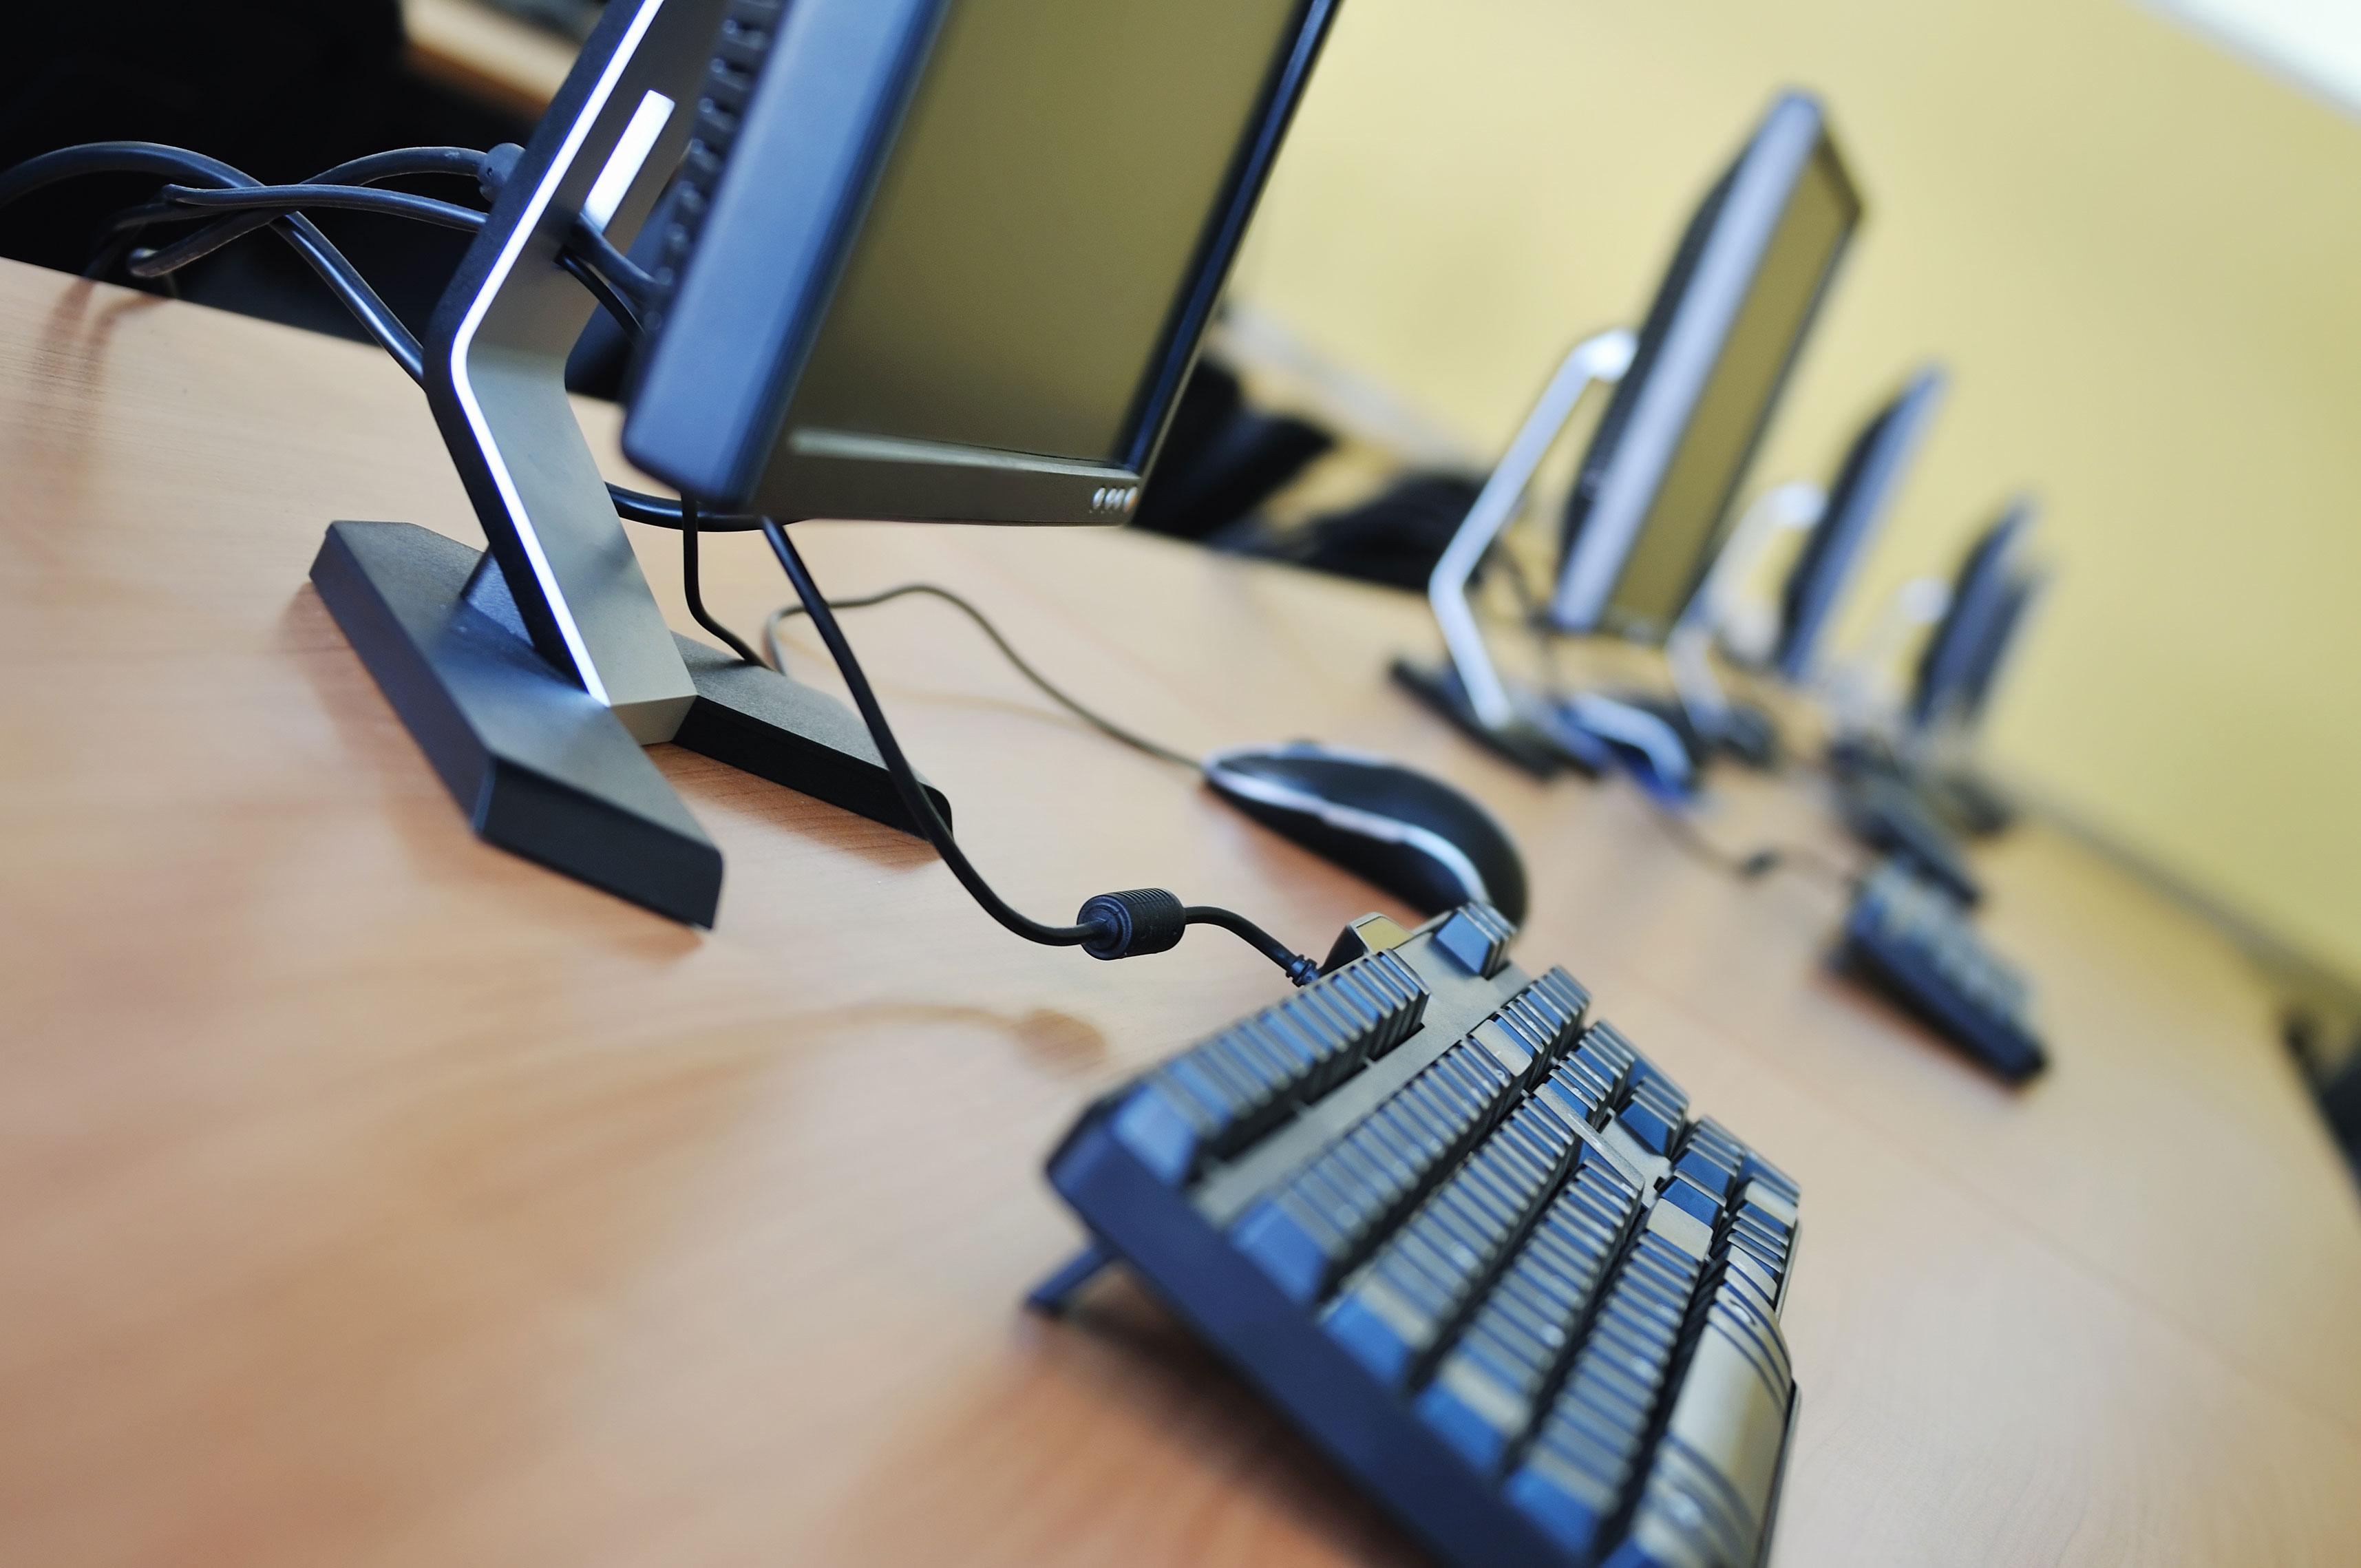 Monitors on desk